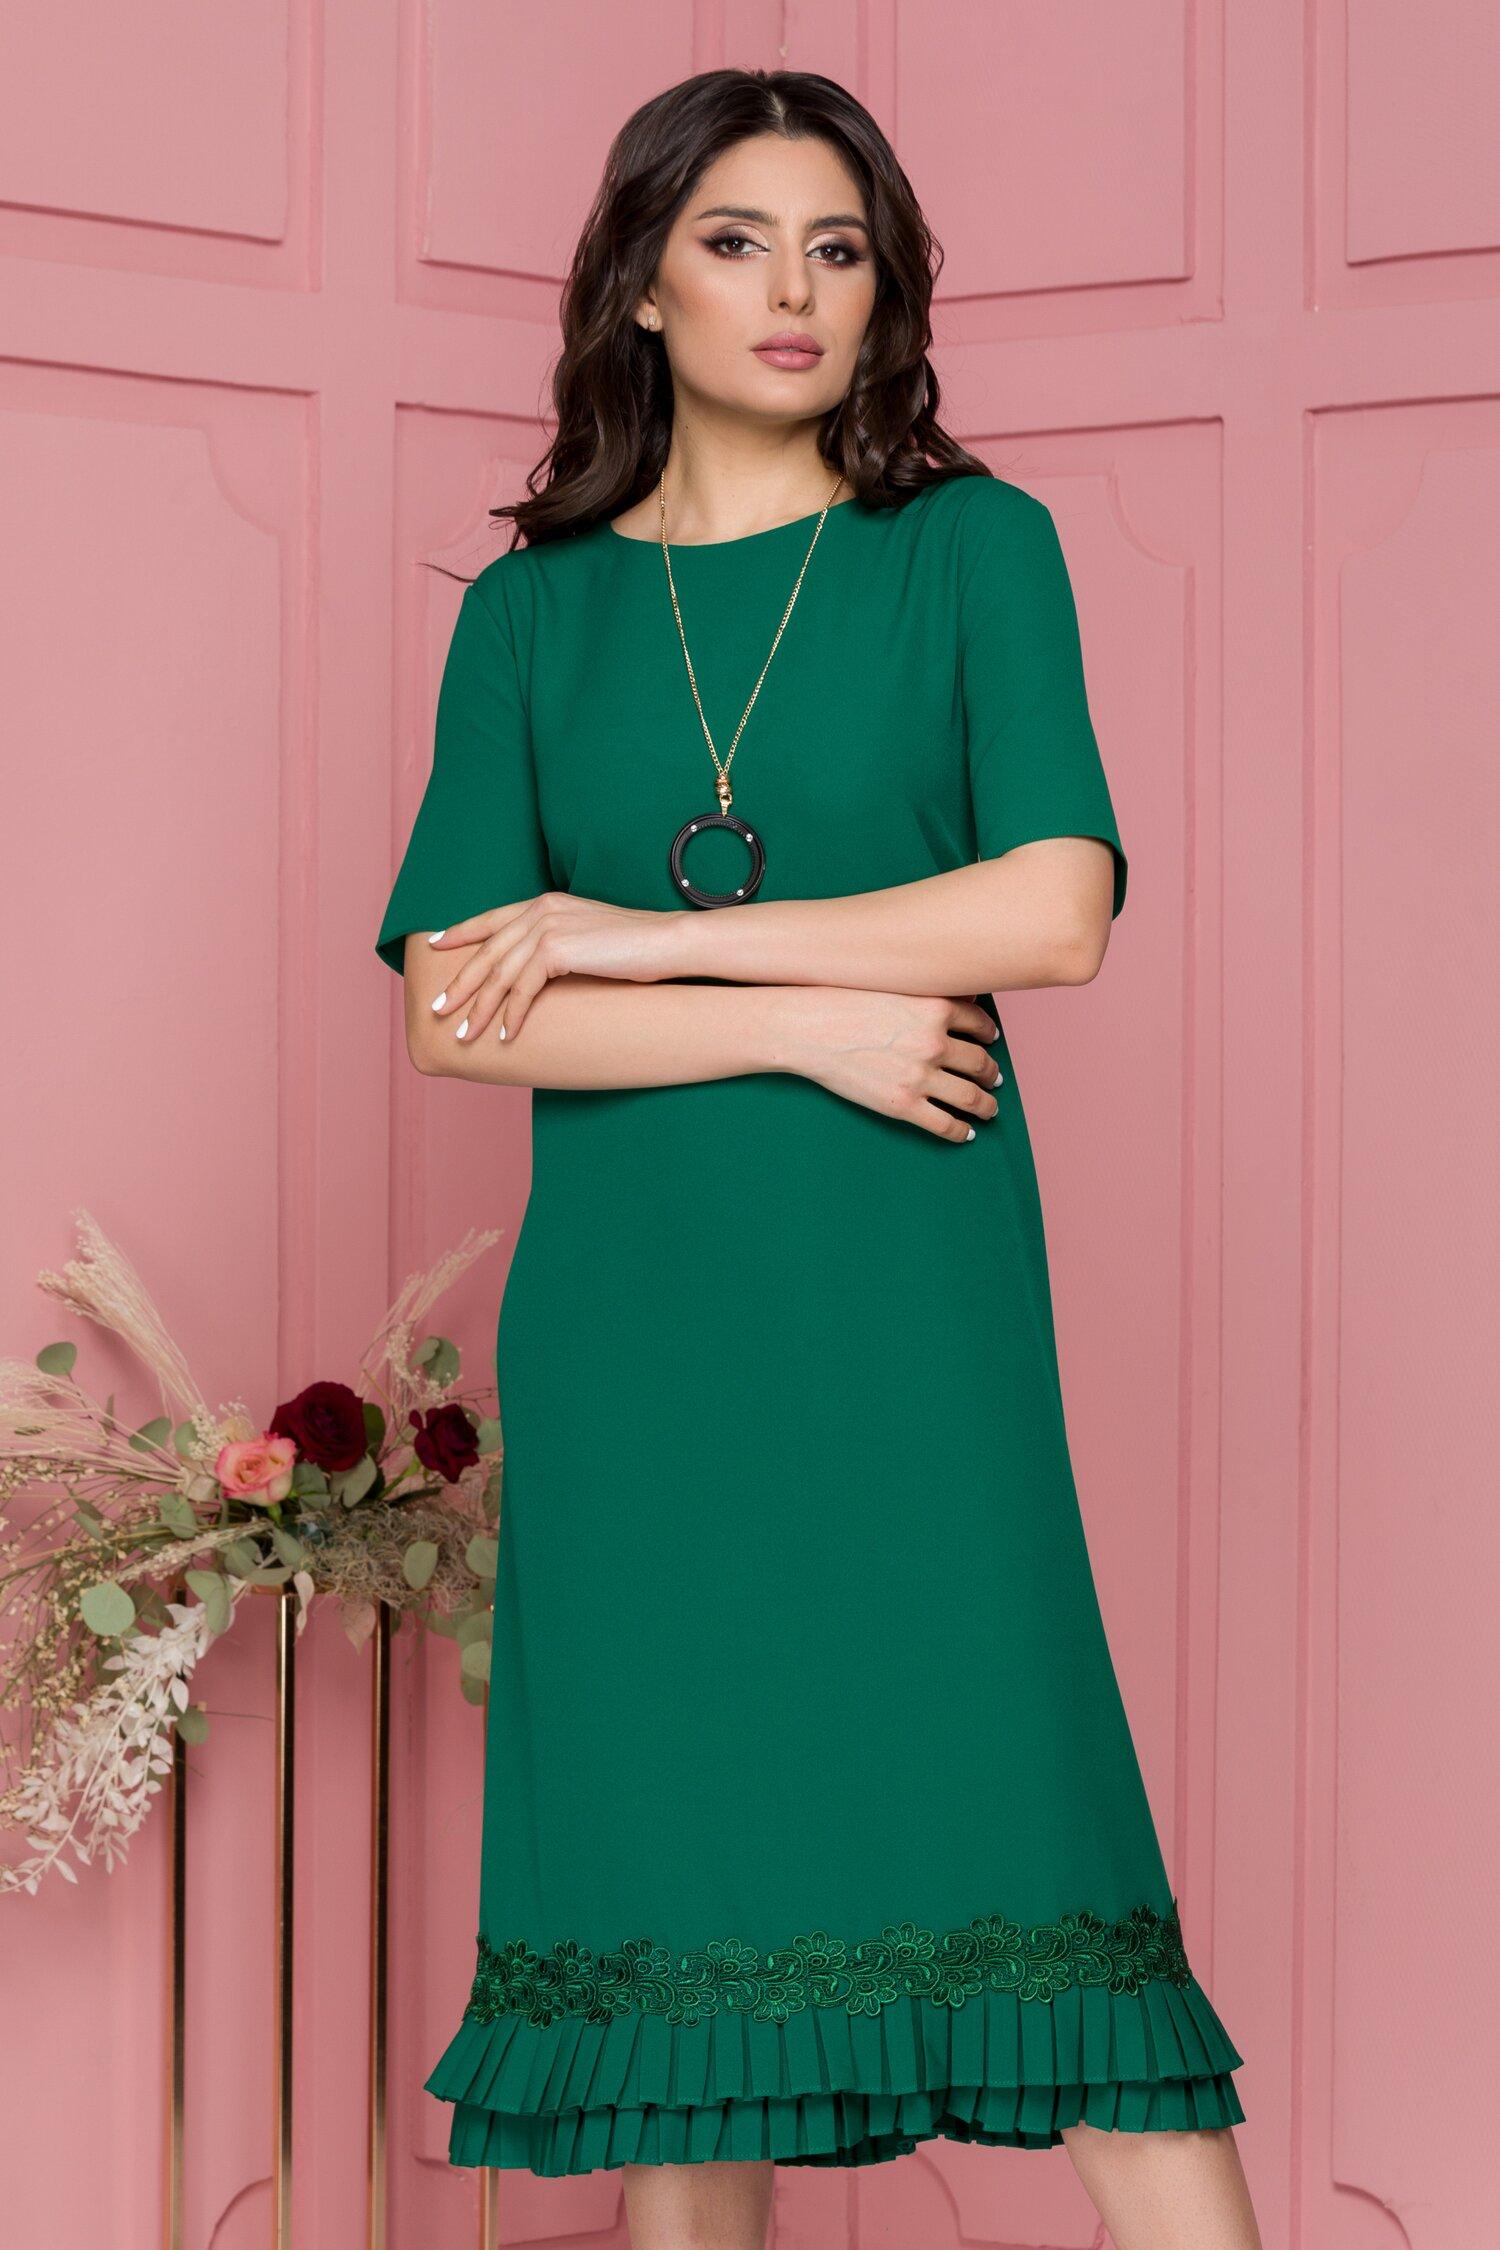 Rochie Katy verde inchis cu volanase plisate la baza